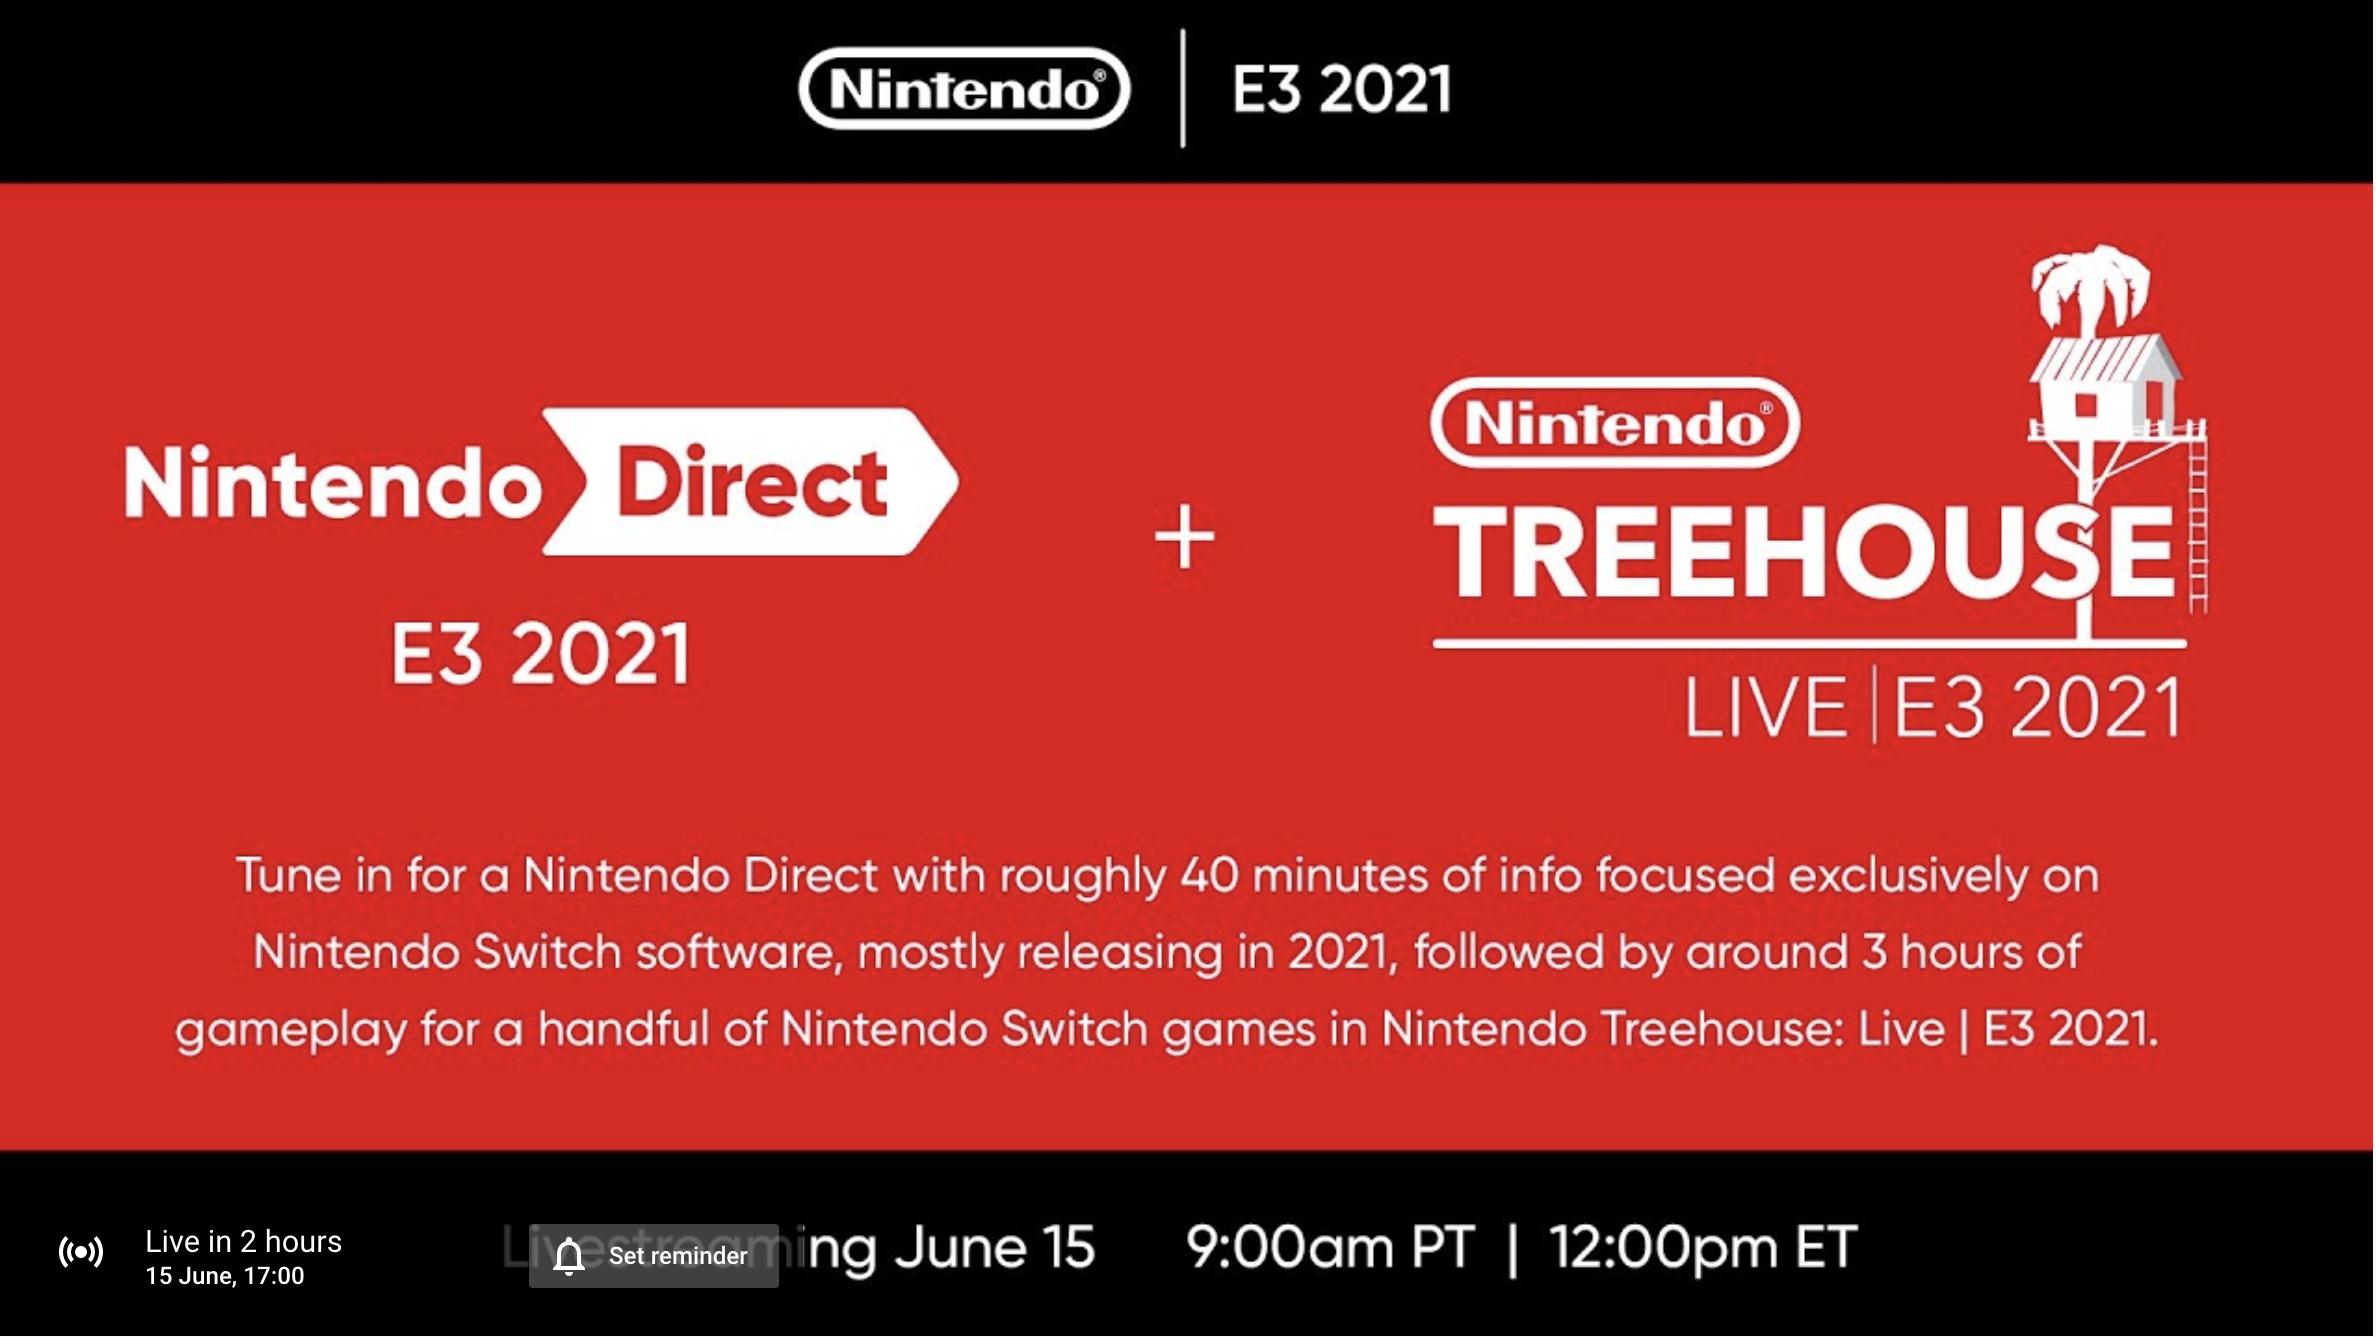 Nintendo Direct E3 2021 placeholder